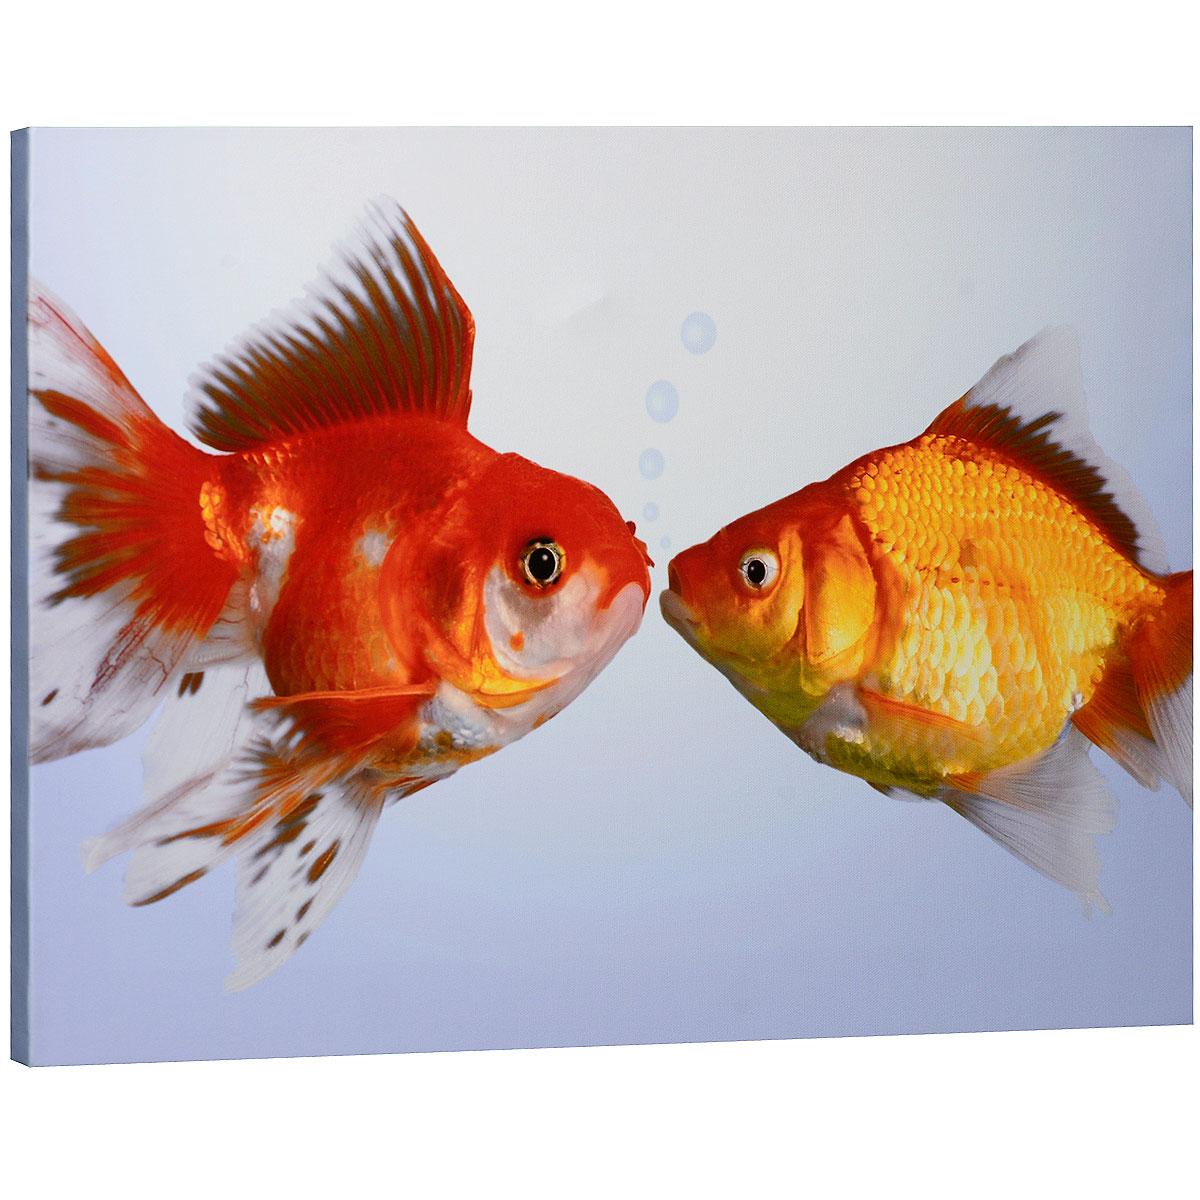 КвикДекор Картина на холсте  Поцелуй , 60 см х 40 см -  Детская комната